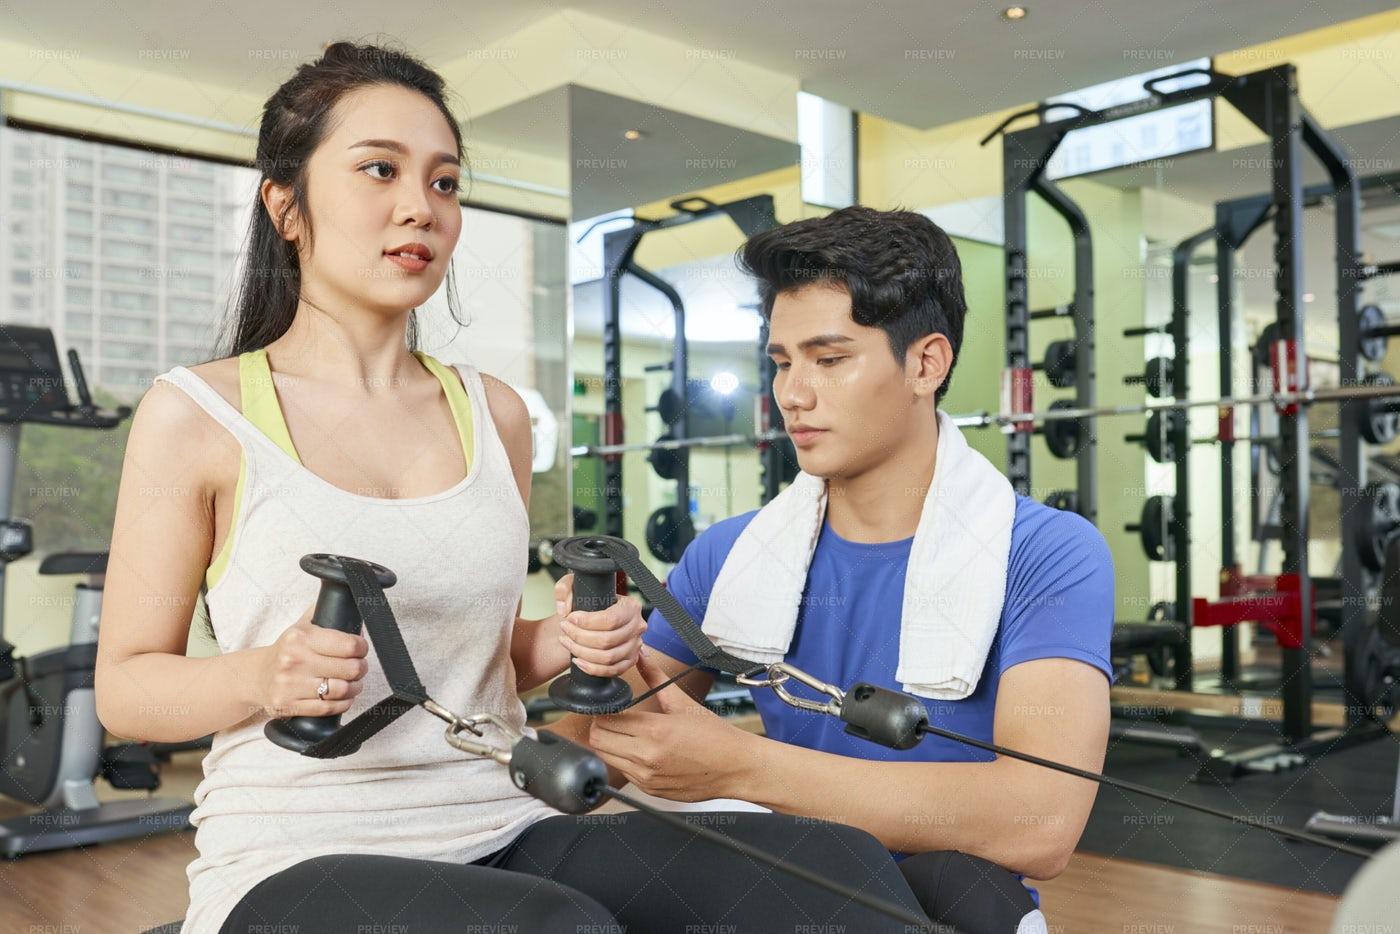 Woman Exercising With Coach: Stock Photos